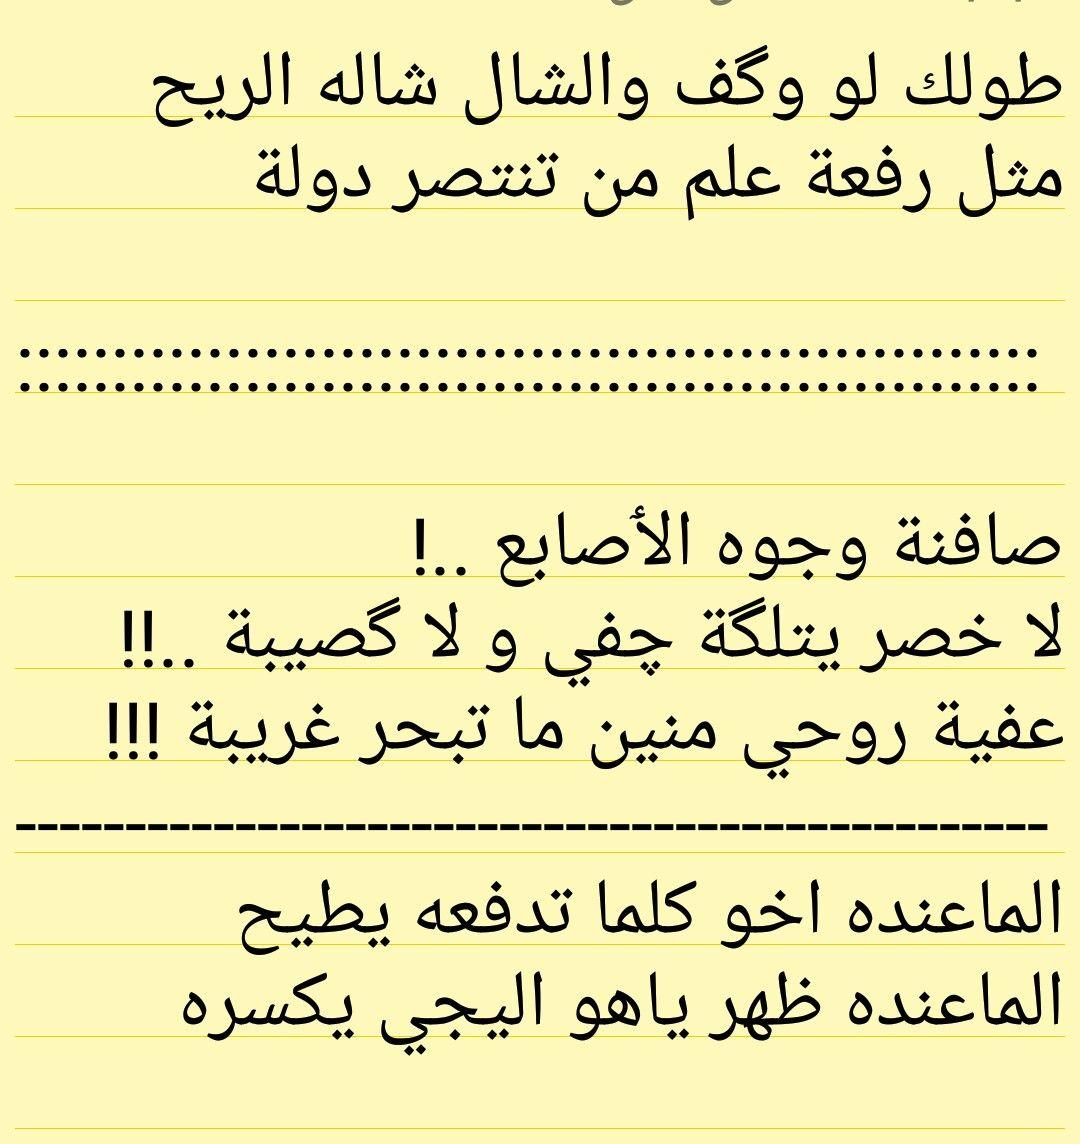 Pin By Jabbar Hasan On شعر شعبي عراقي Arabic Calligraphy